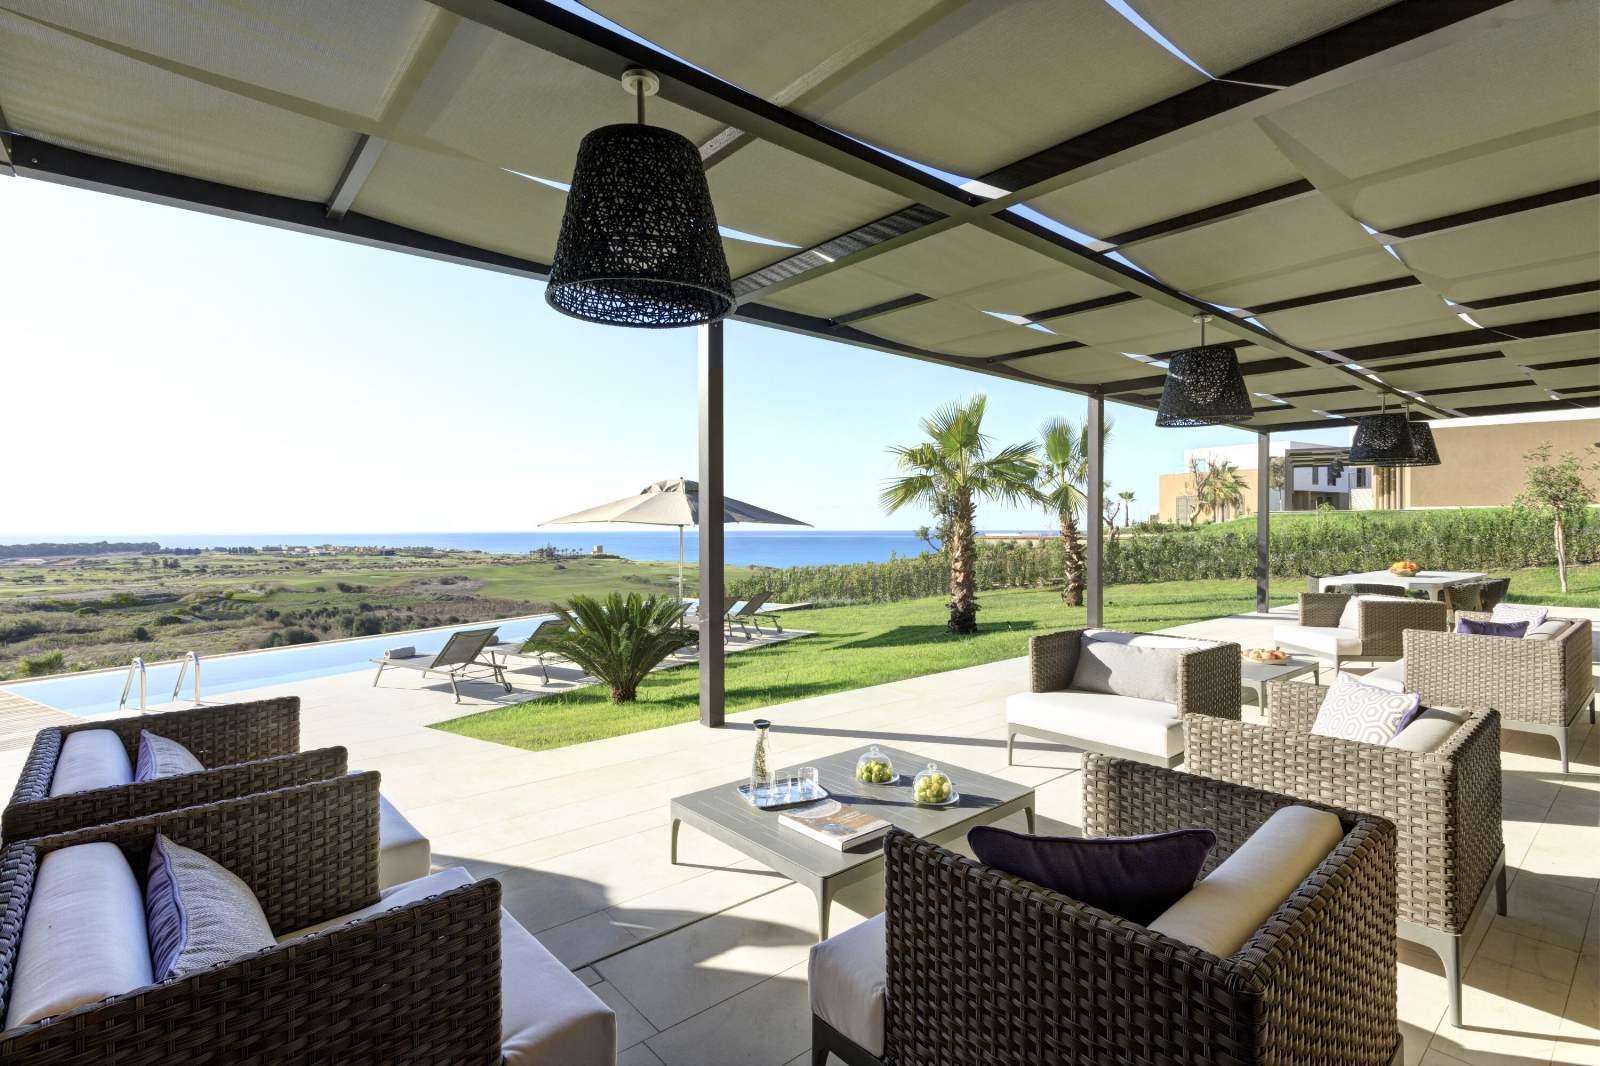 Verdura Resort: Private Villas: room / property / locale photo. Image 3